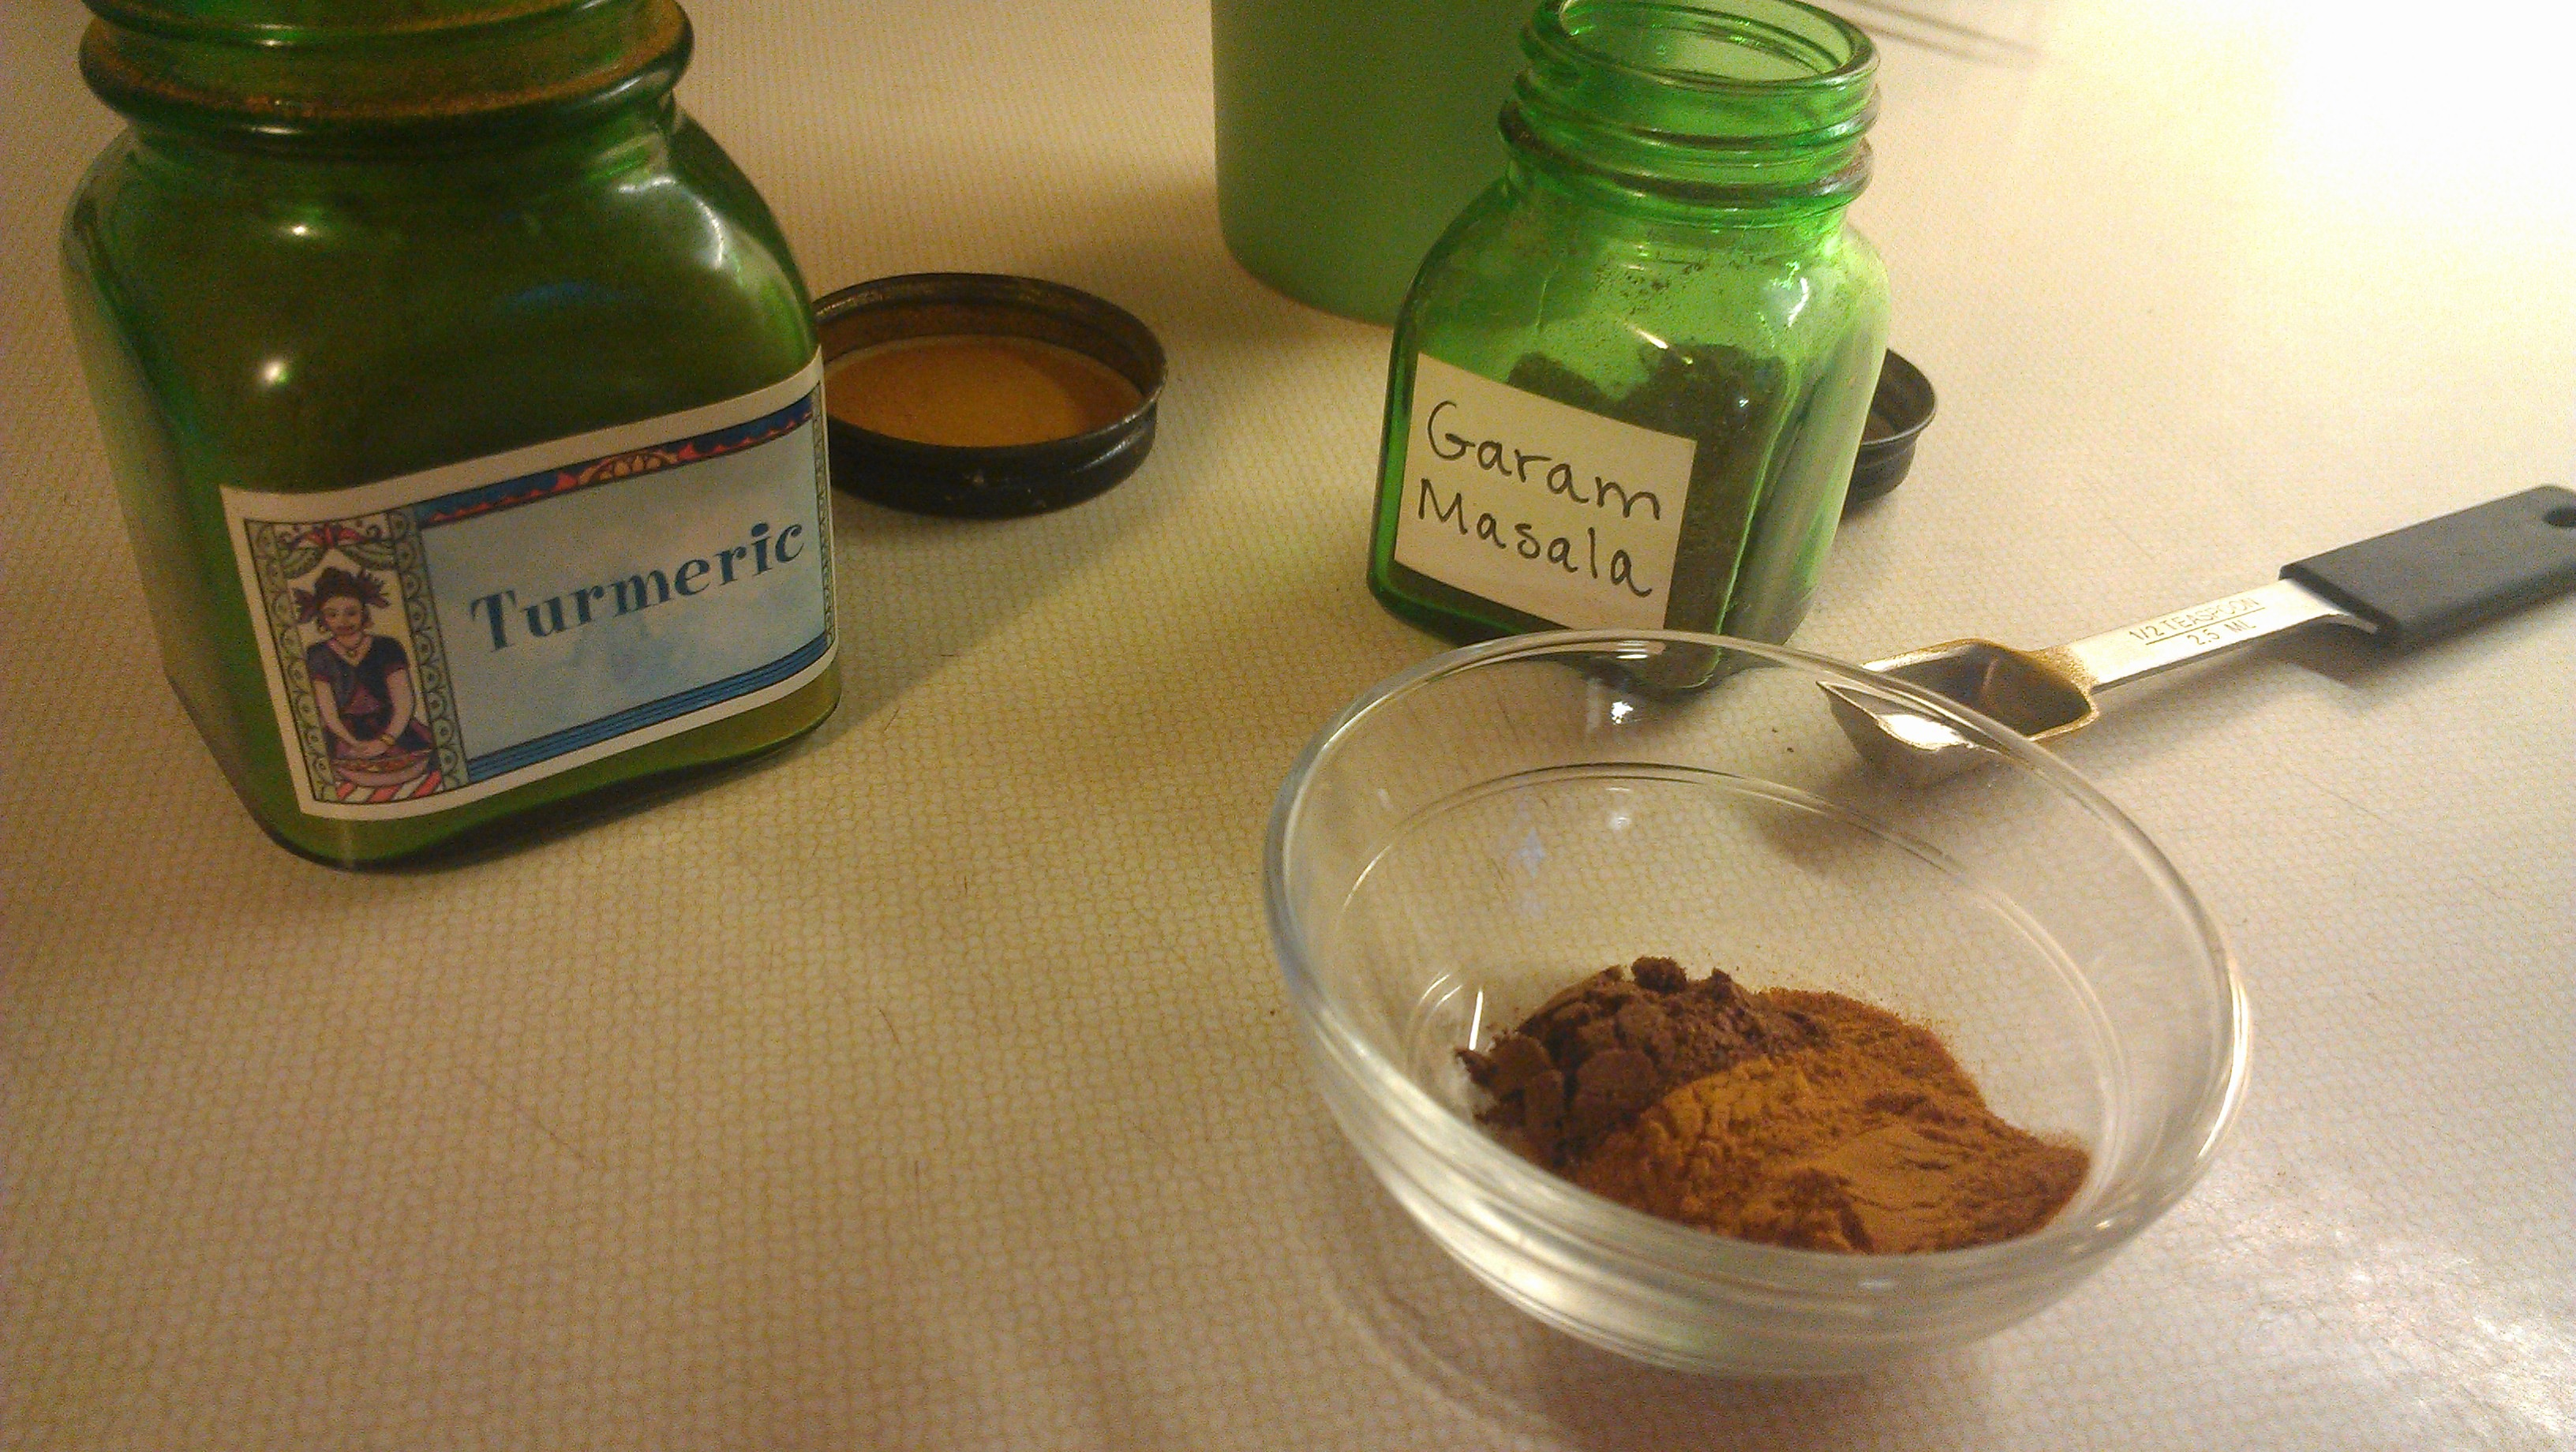 Turmeric and Garam Masala